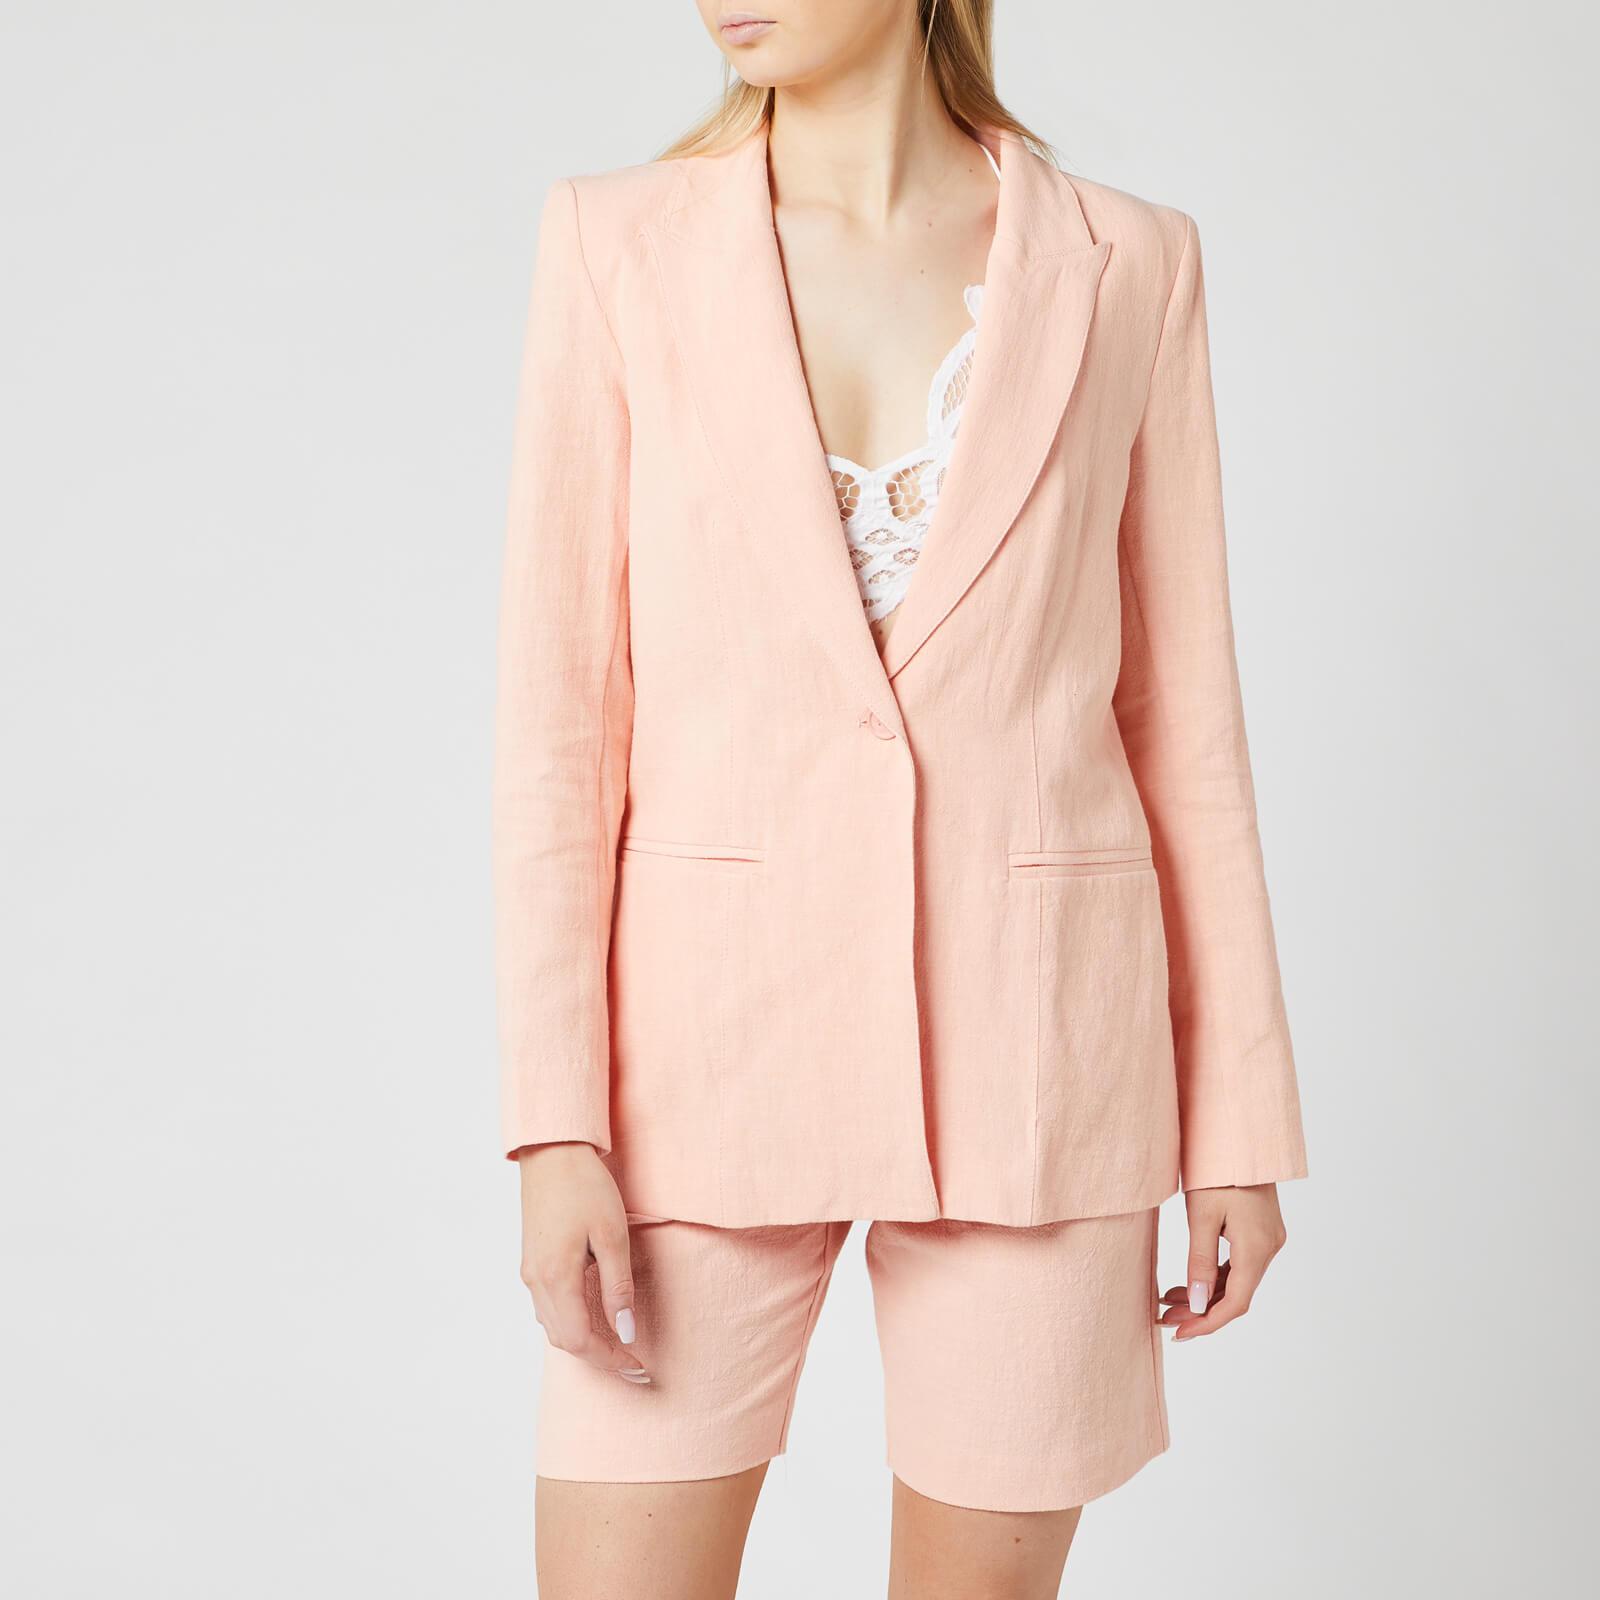 Bec & Bridge Women's Coral Club Jacket - Peach - UK 14